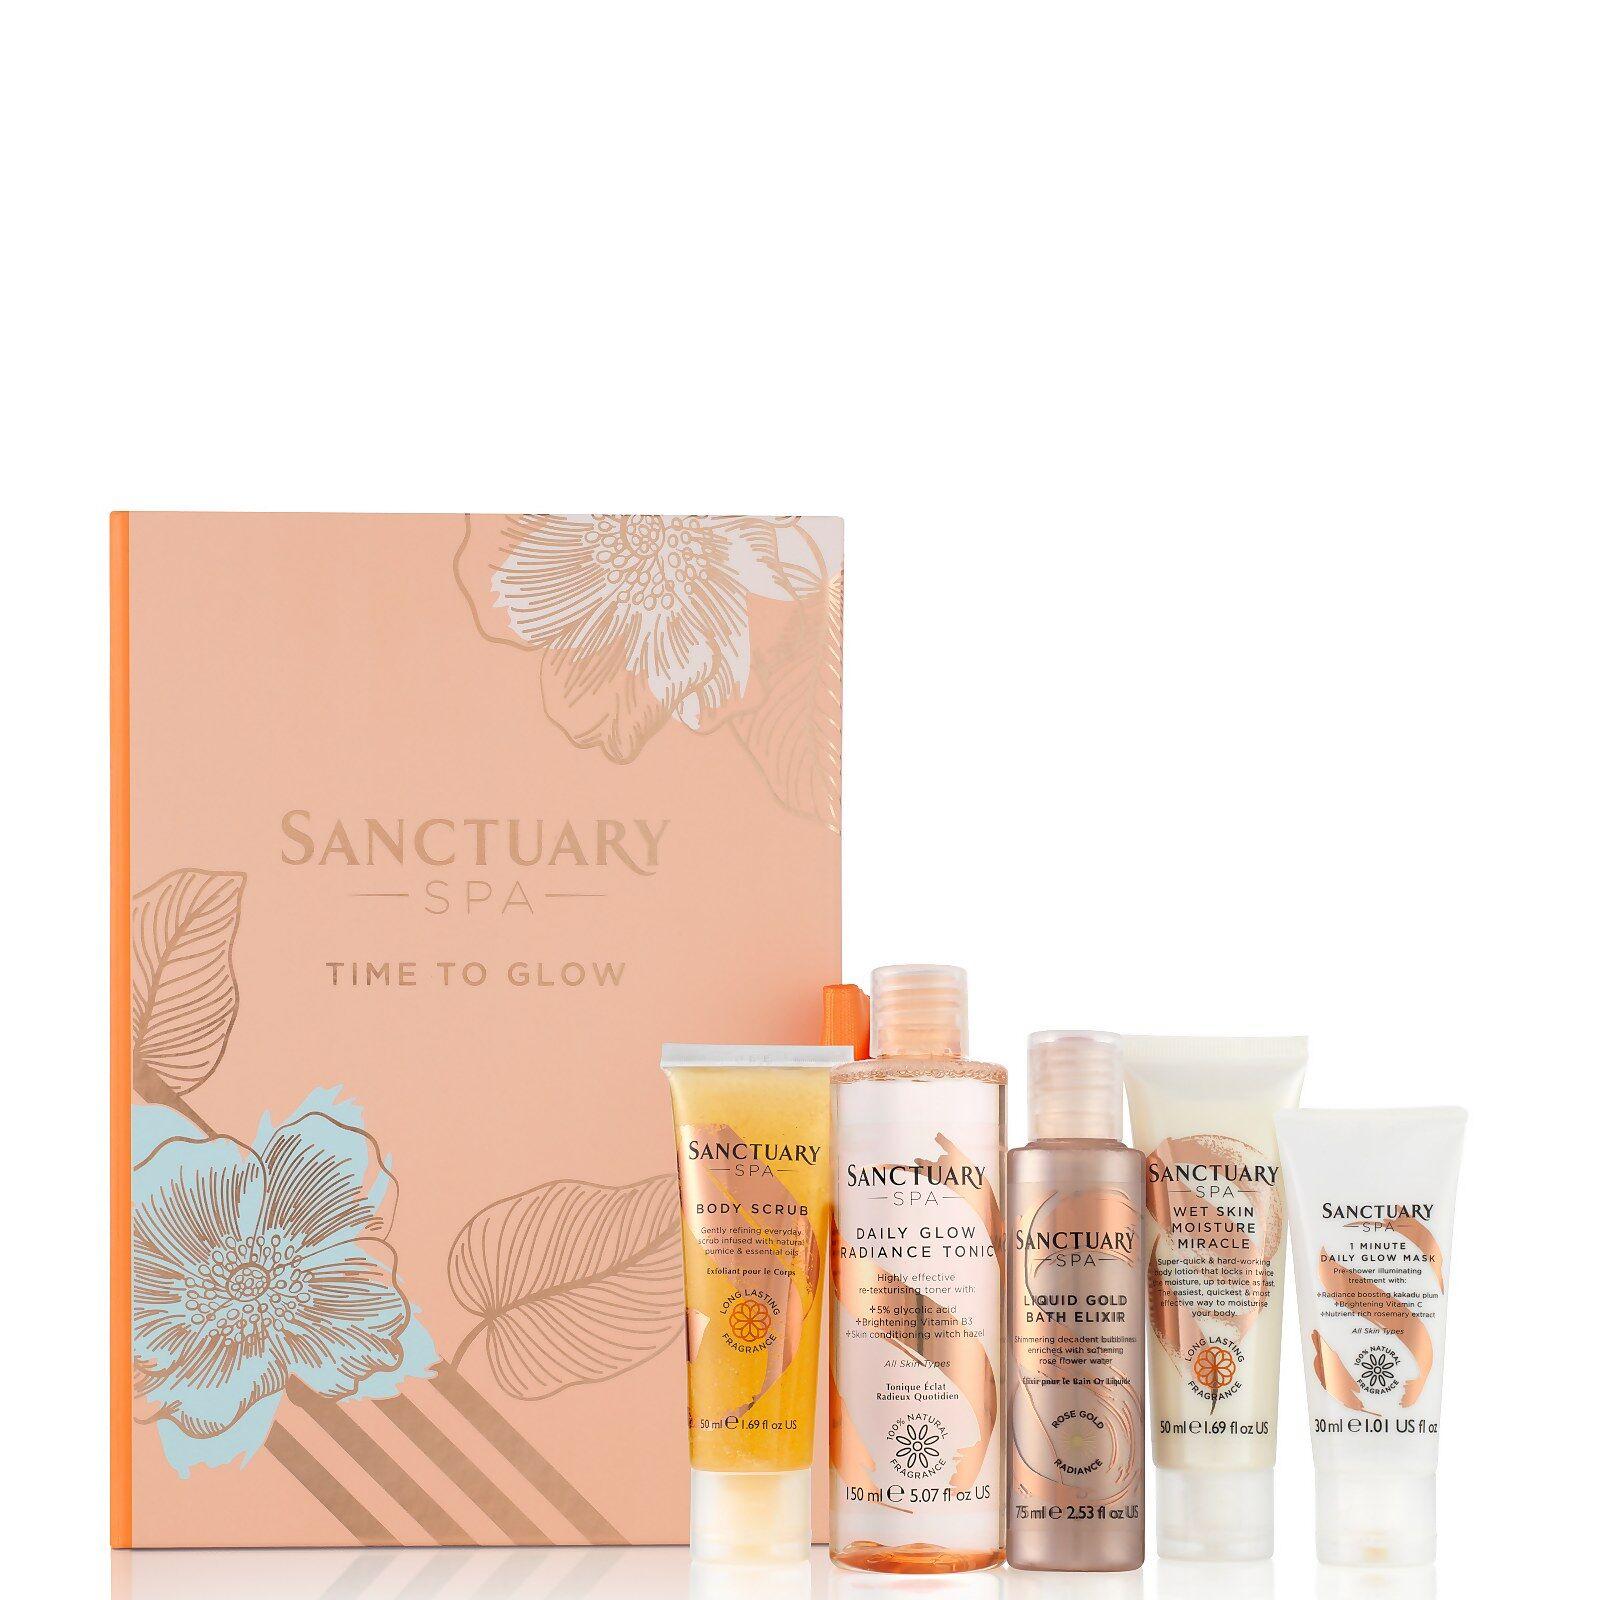 Sanctuary Spa Time to Glow Gift Set